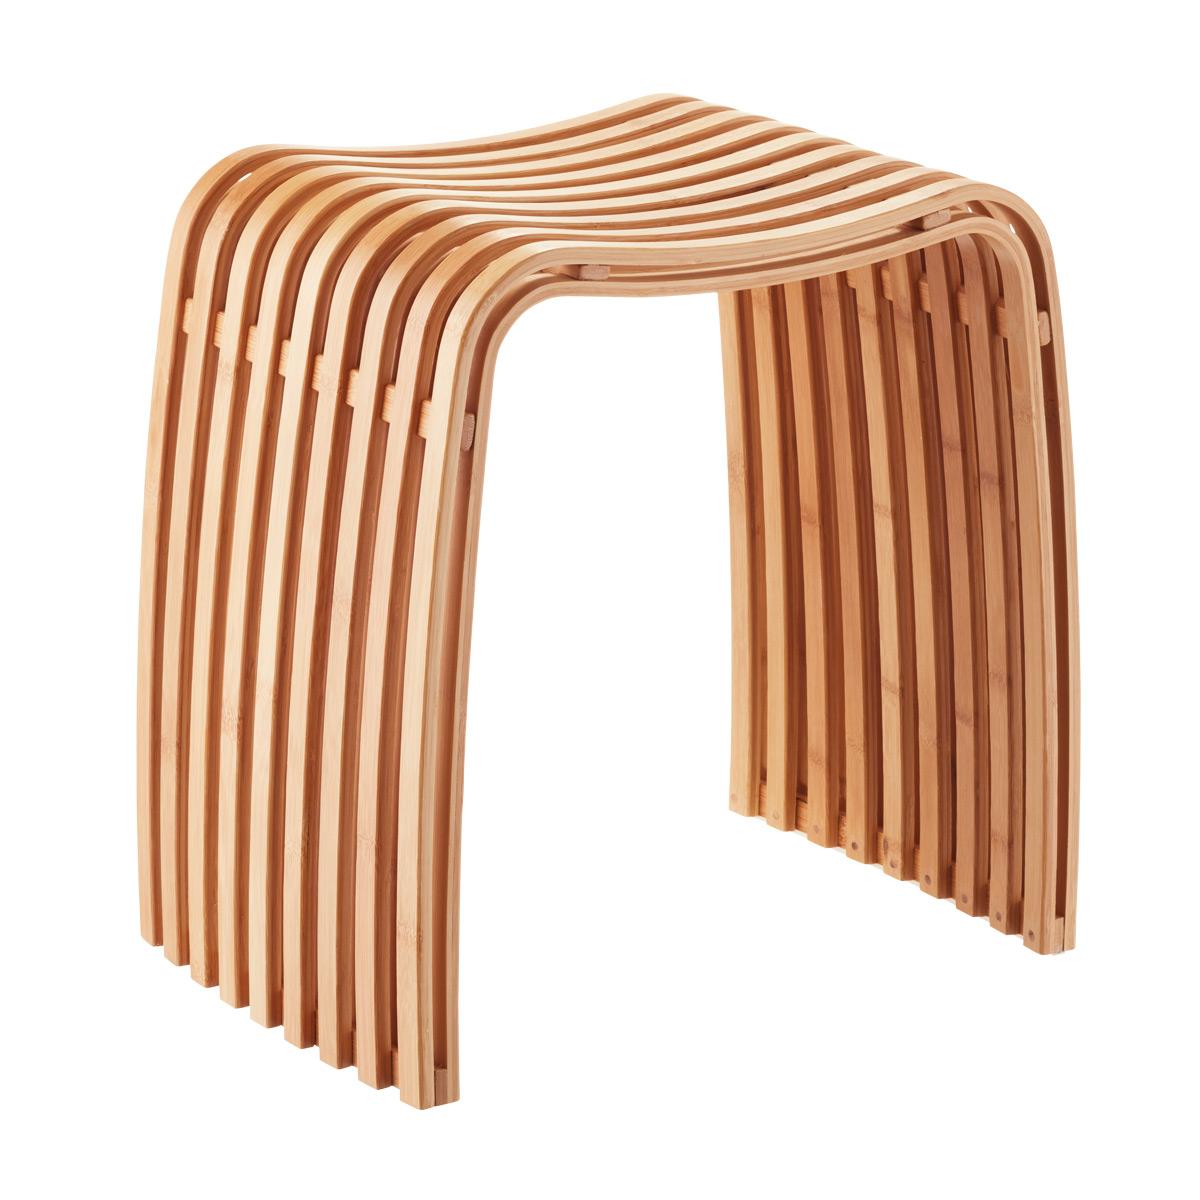 Bamboo Bedroom Stool